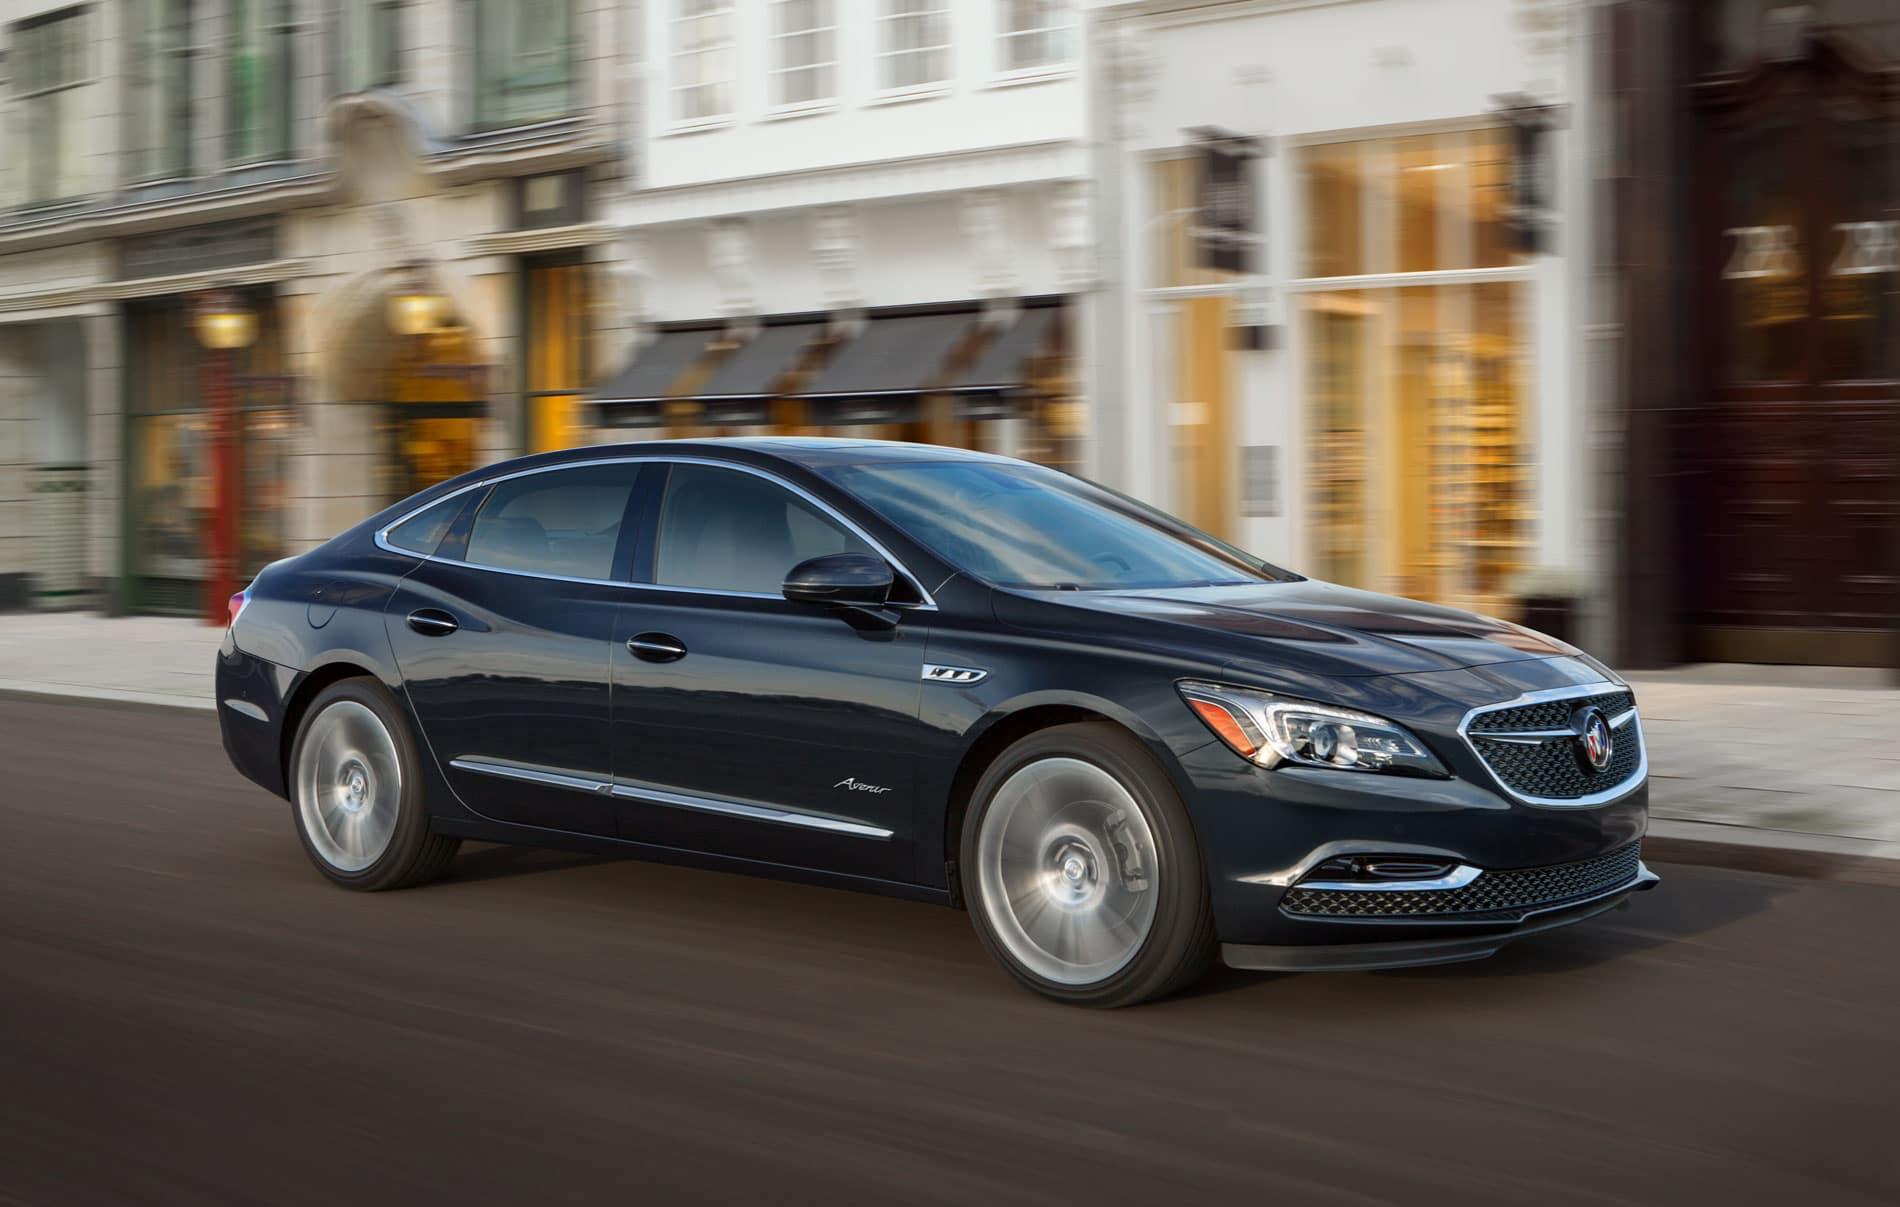 Sensational Buick Lacrosse Vs Lincoln Mkz Midsize Luxury Sedan Showdown Wiring Cloud Genionhyedimohammedshrineorg